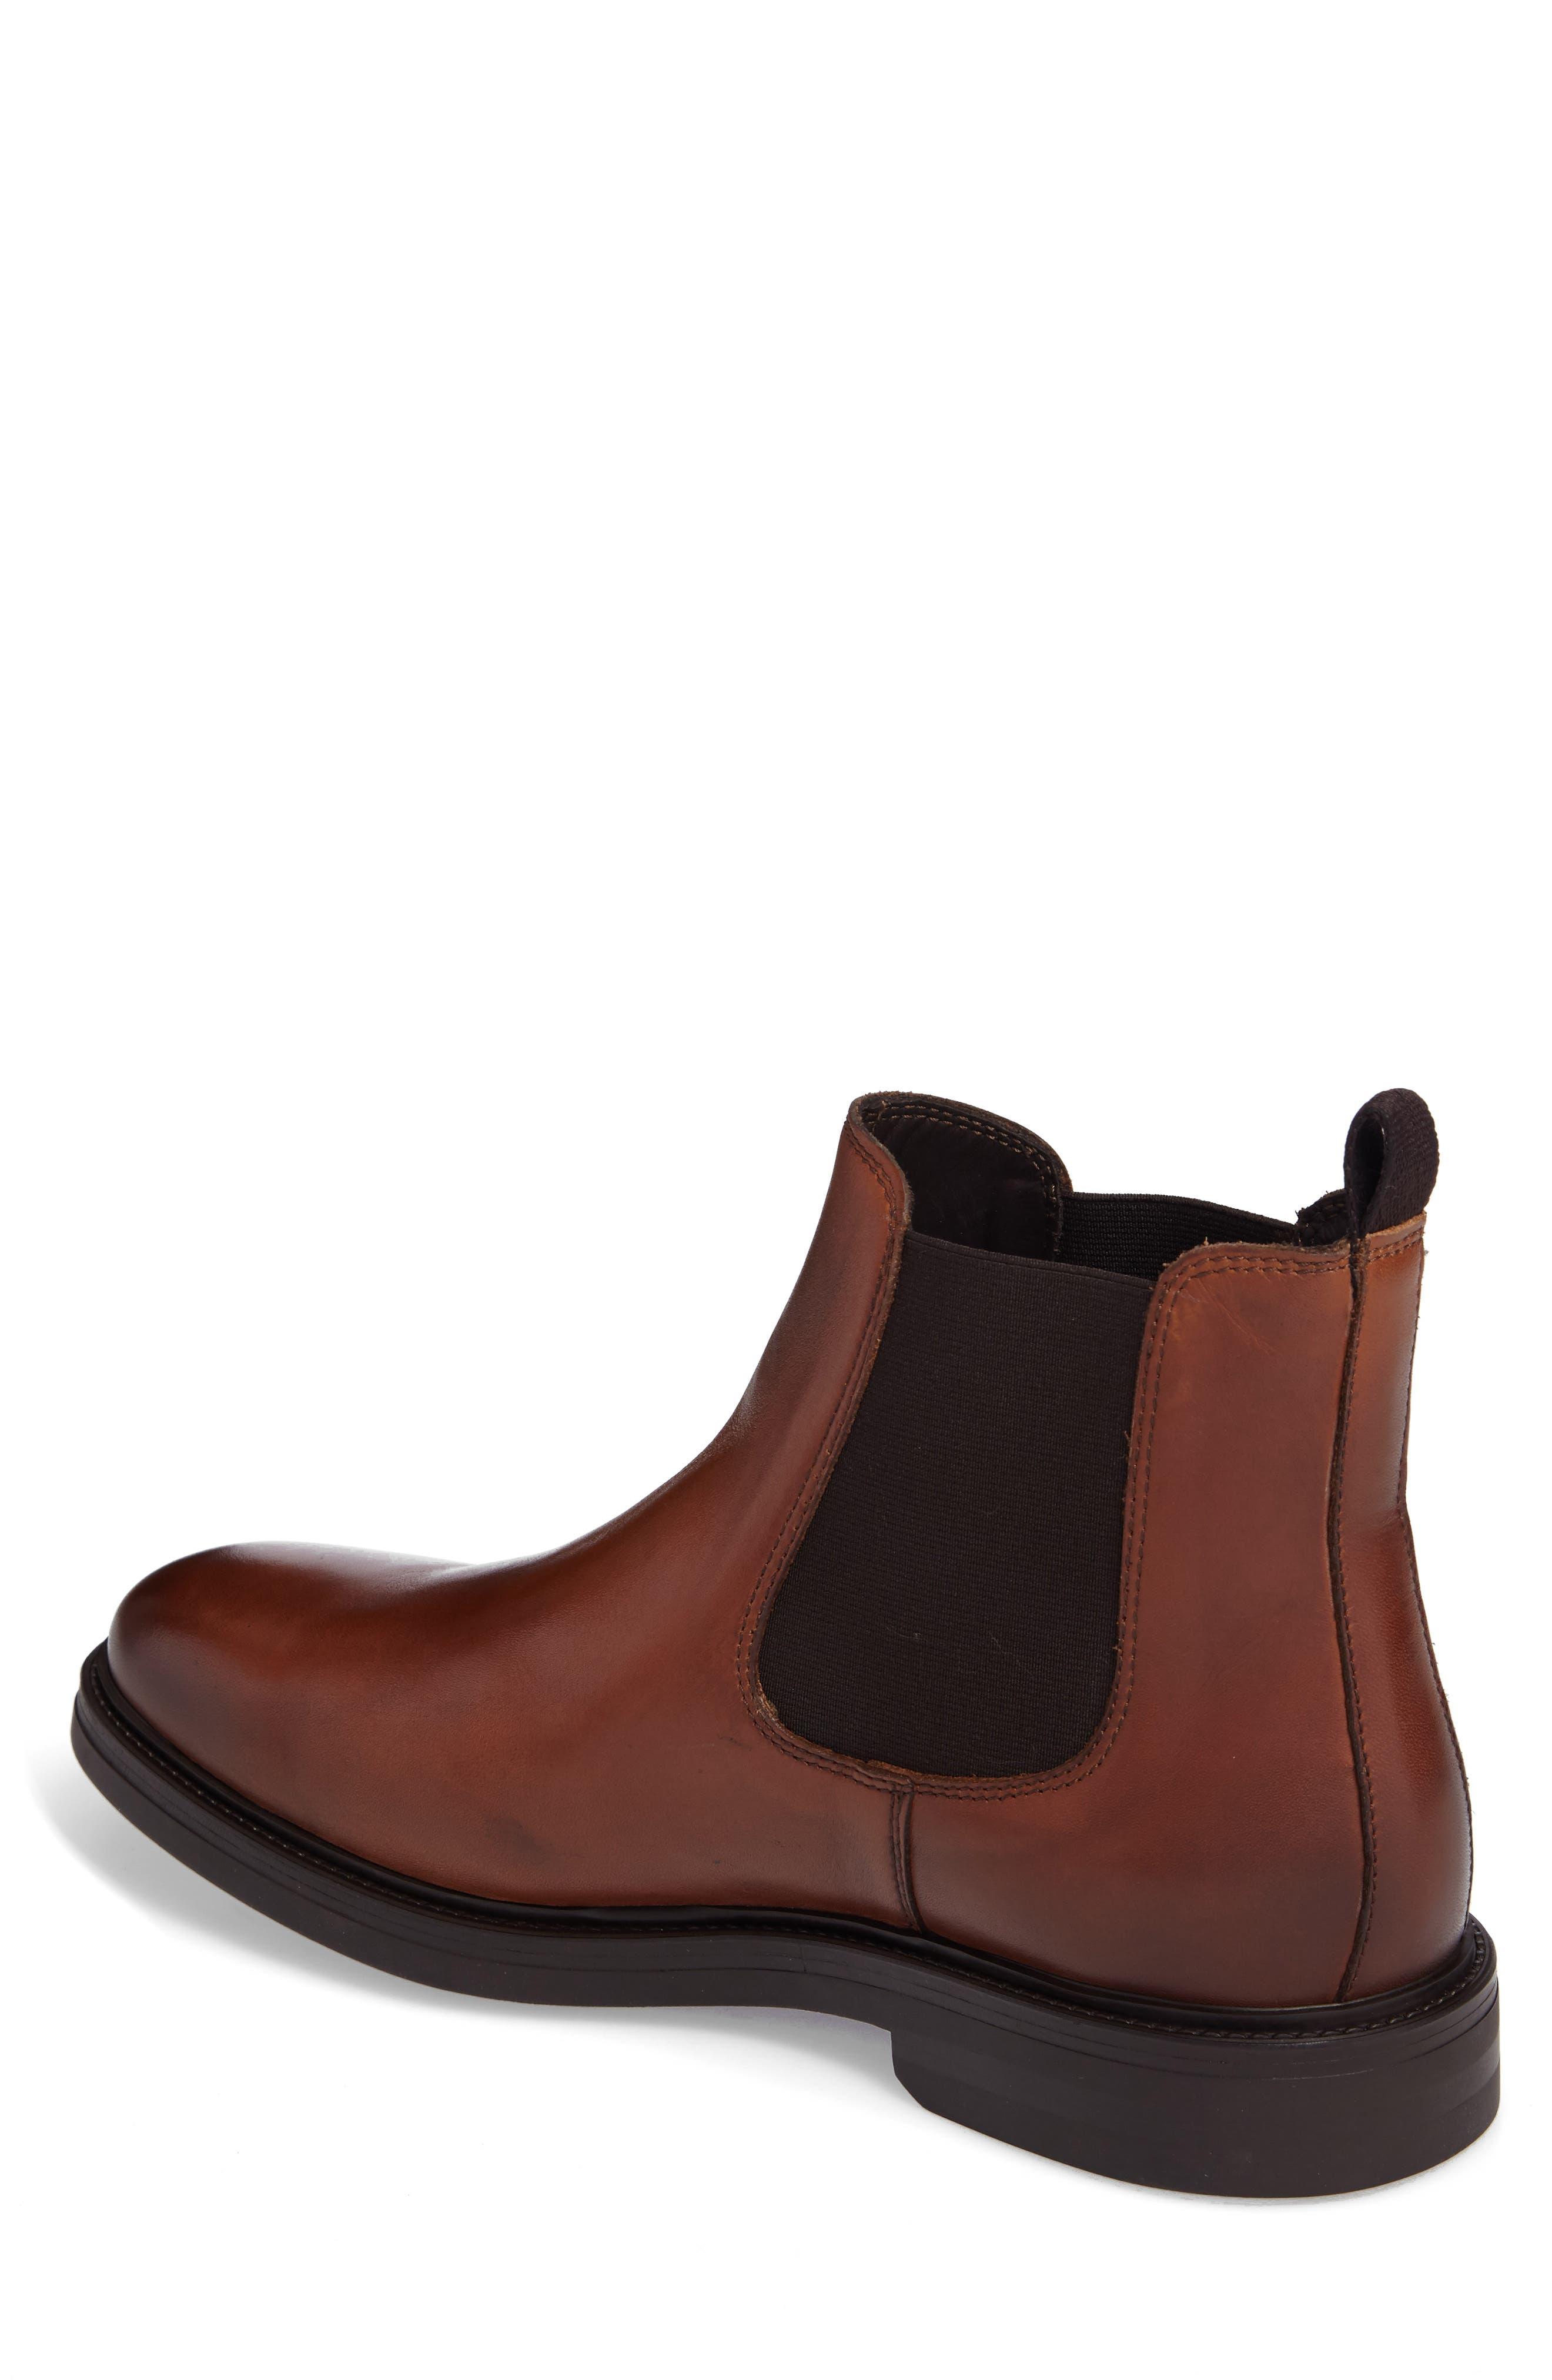 Chelsea Boot,                             Alternate thumbnail 2, color,                             Caramel